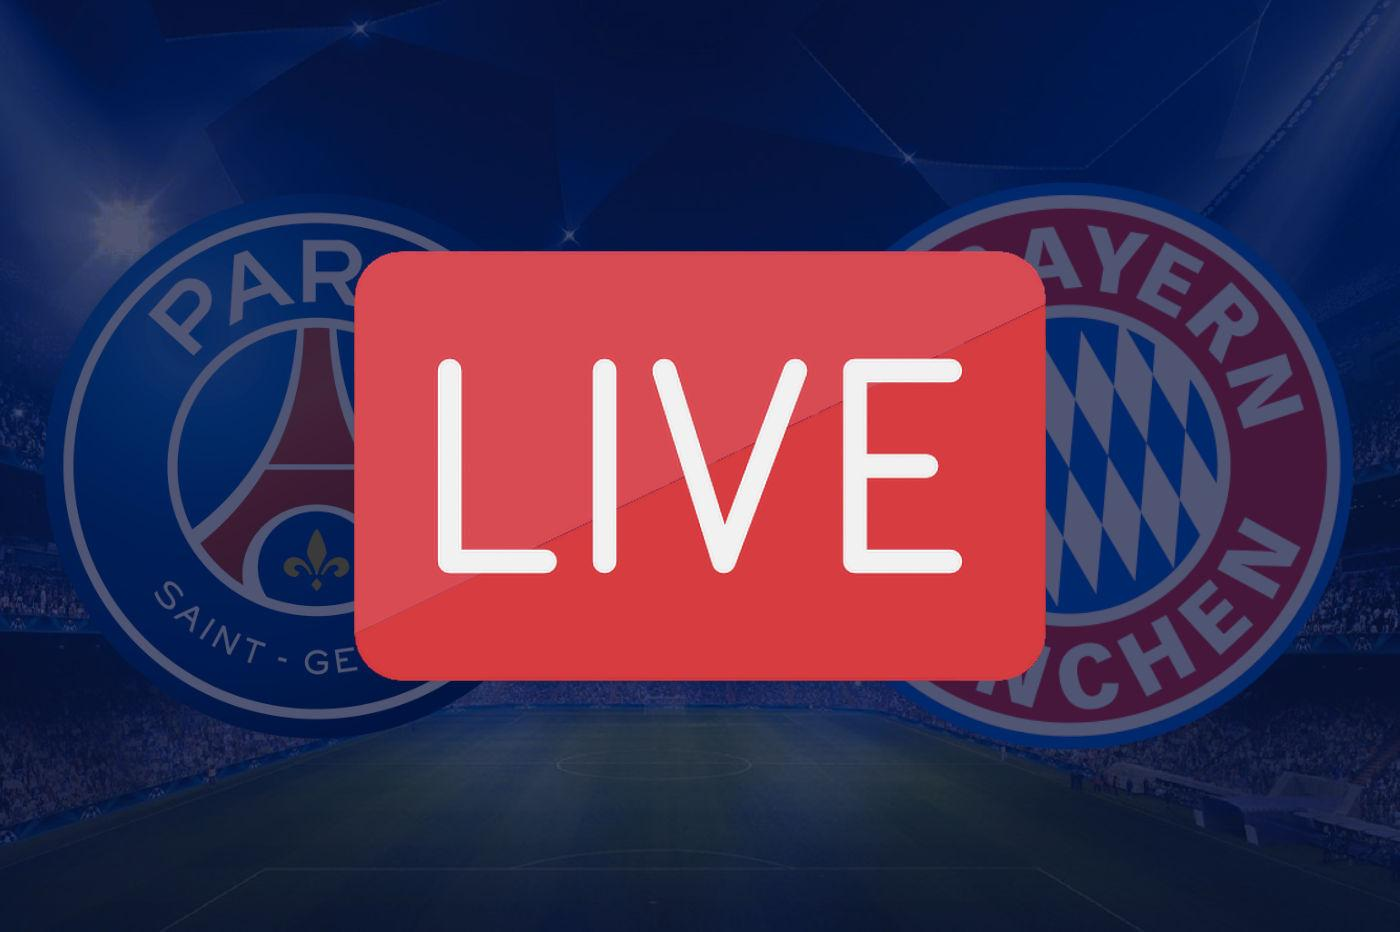 Finala UEFA Champions League - unde se poate vedea live și online gratis